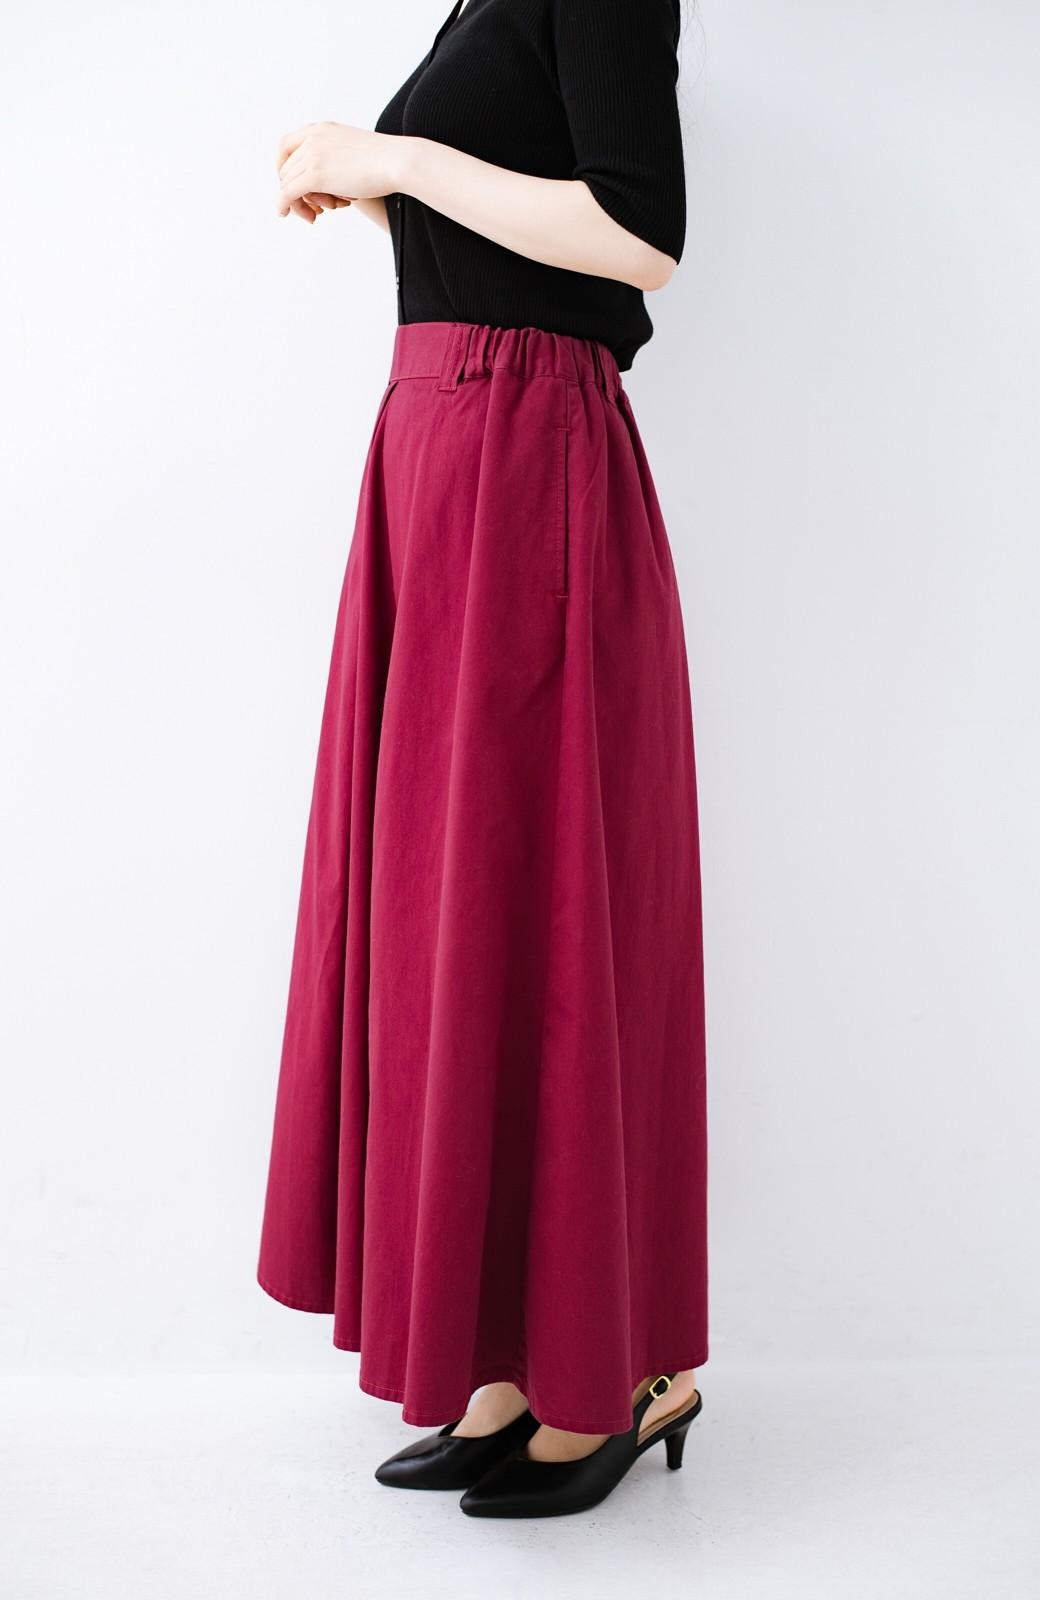 haco! ロングシーズン楽しめる タックボリュームのチノロングスカート <パープル>の商品写真4